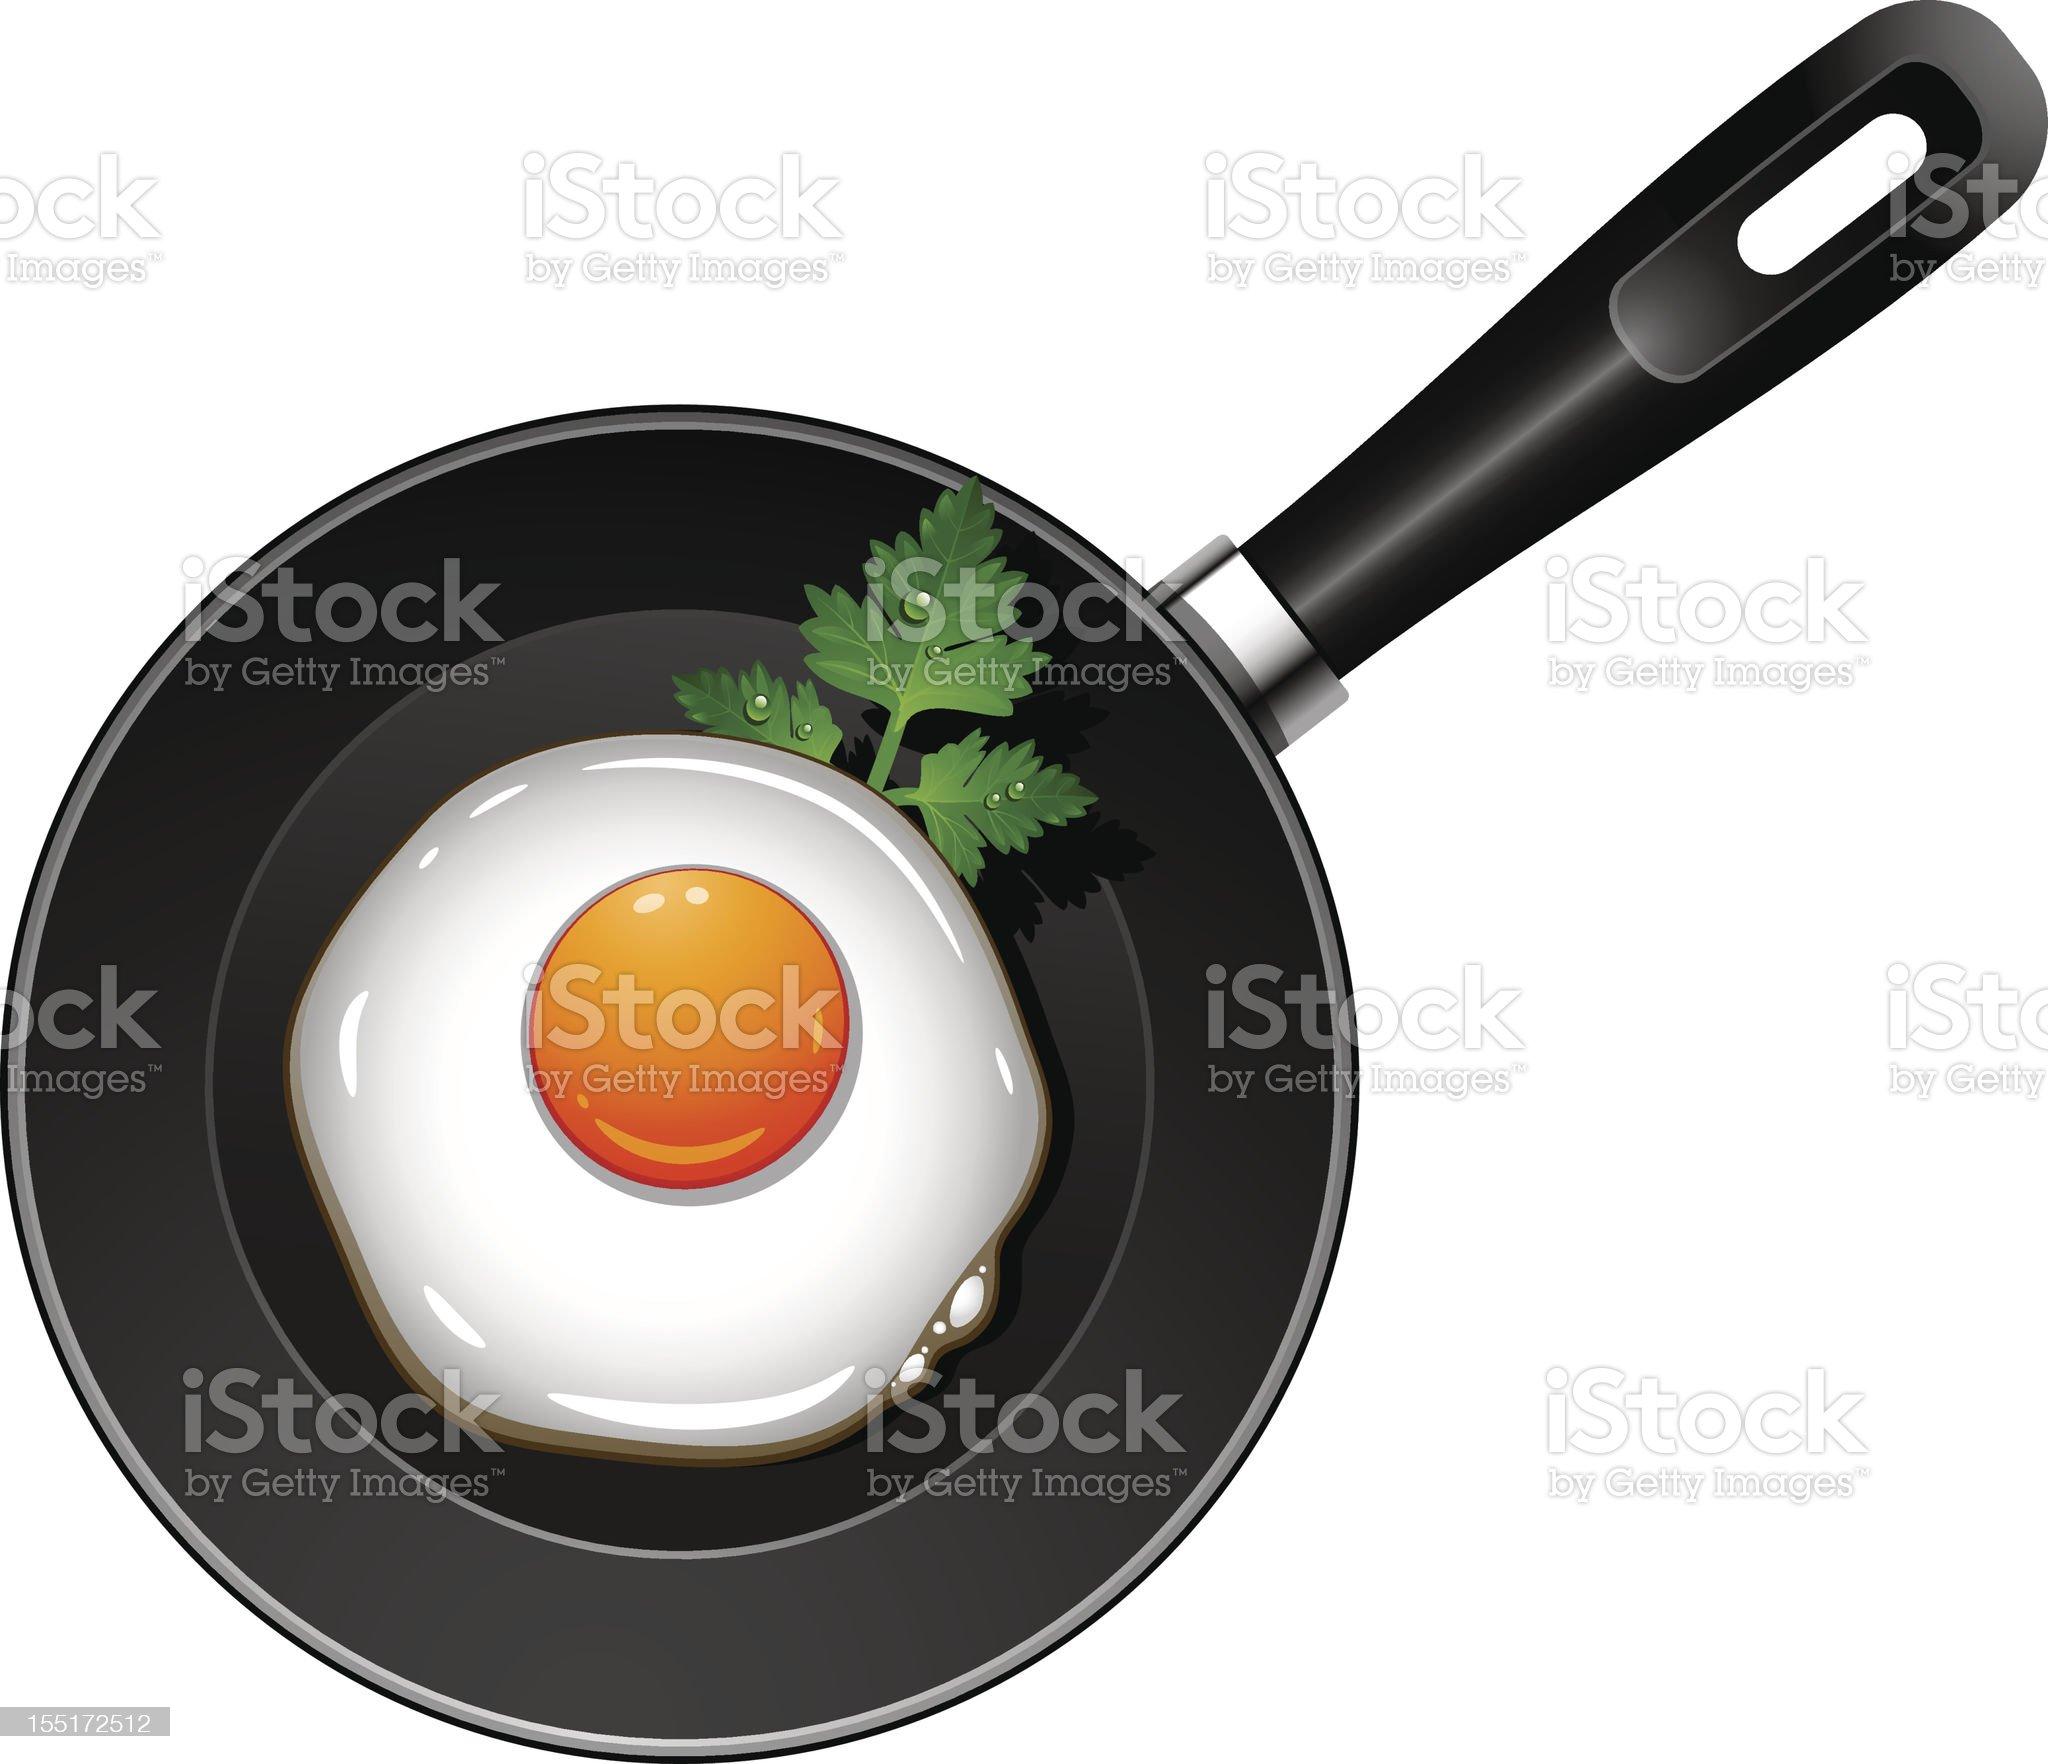 Fried egg on pan royalty-free stock vector art